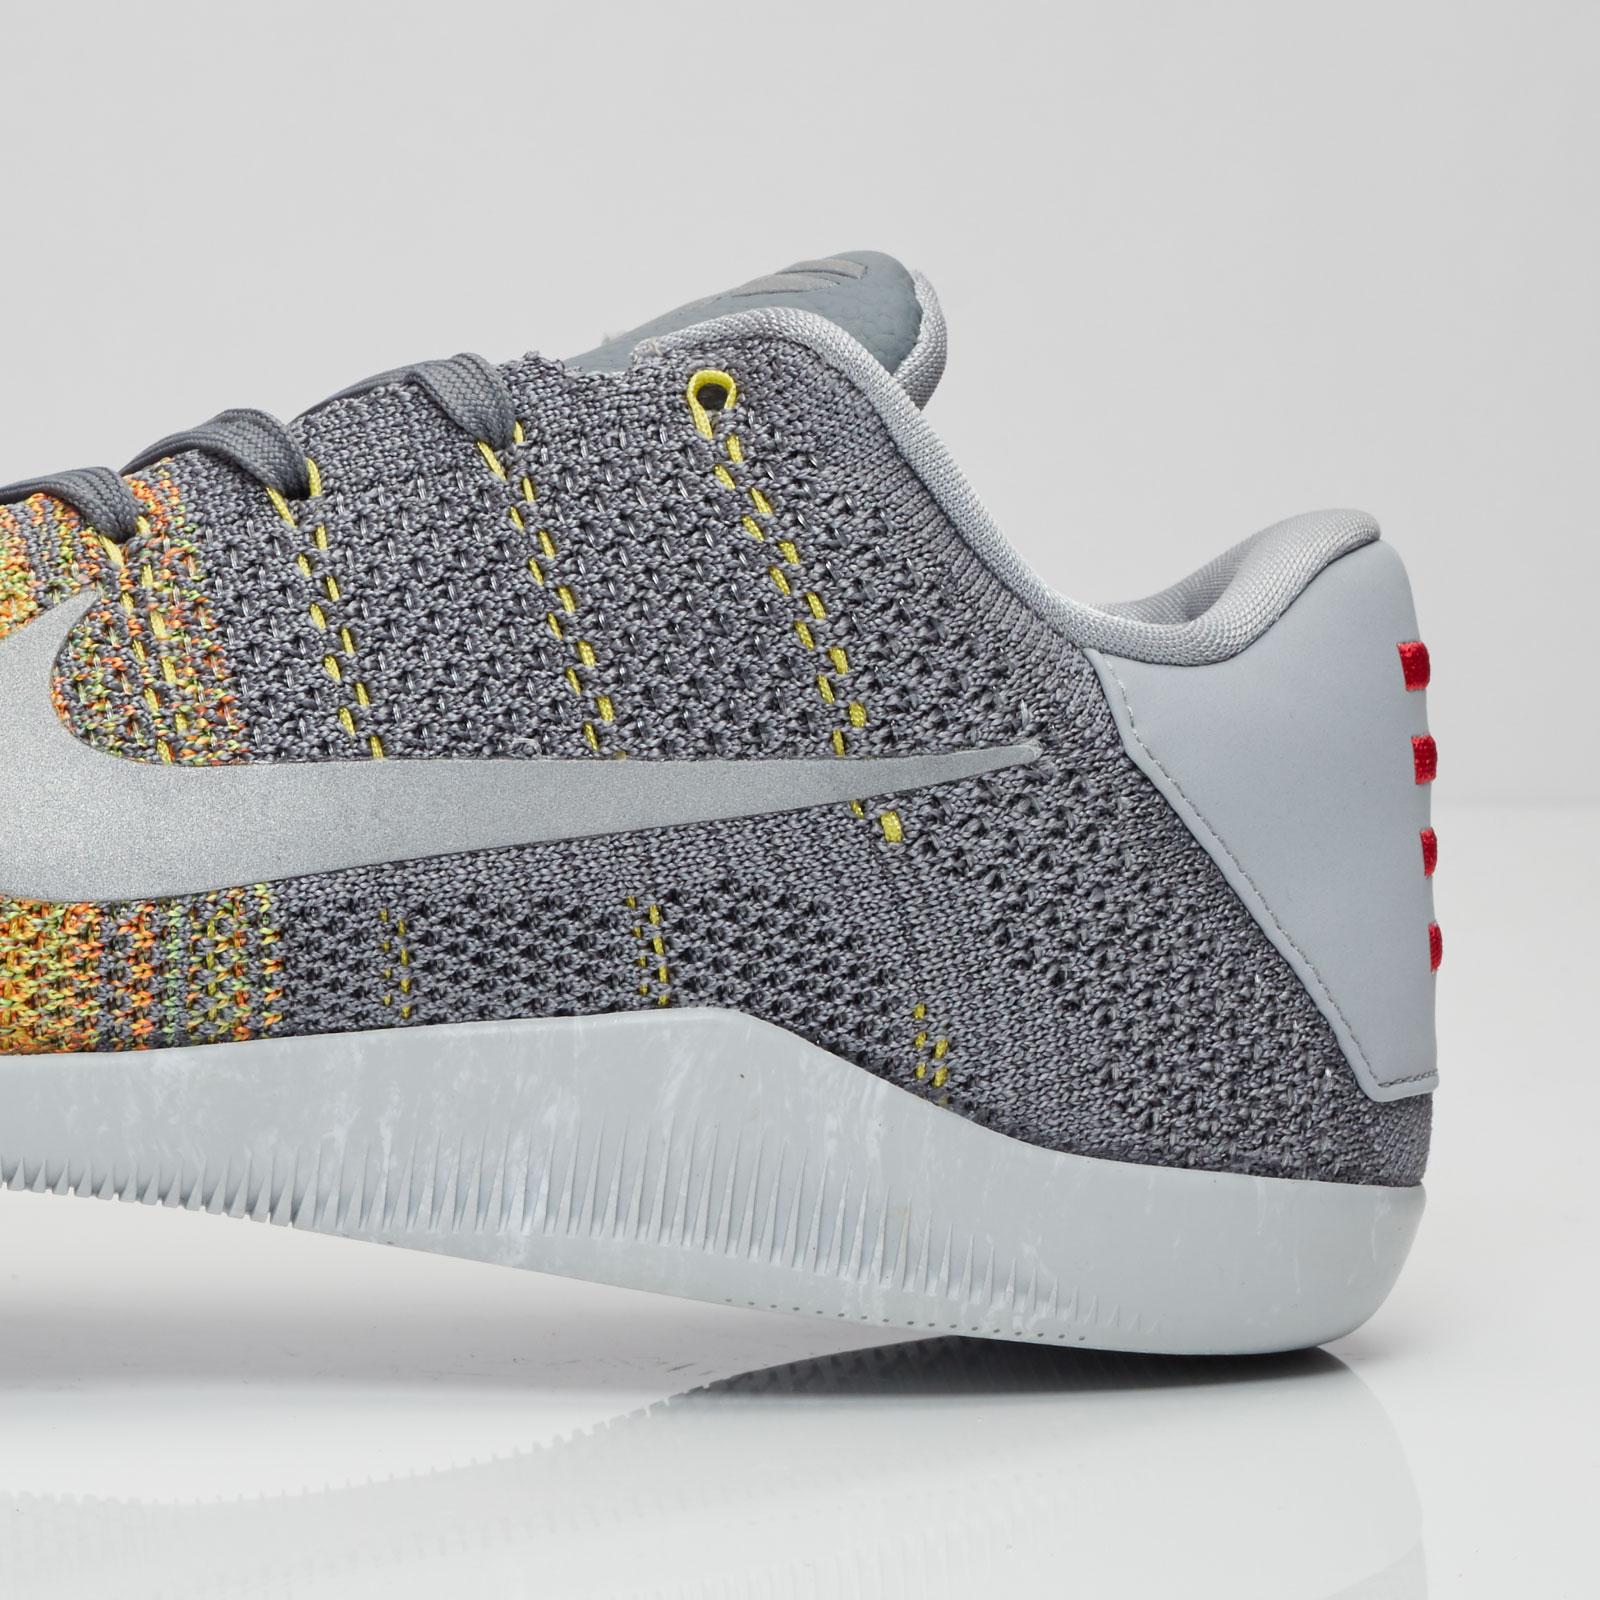 Nike Kobe XI Elite Low - 822675-037 - Sneakersnstuff  fe7ac026b